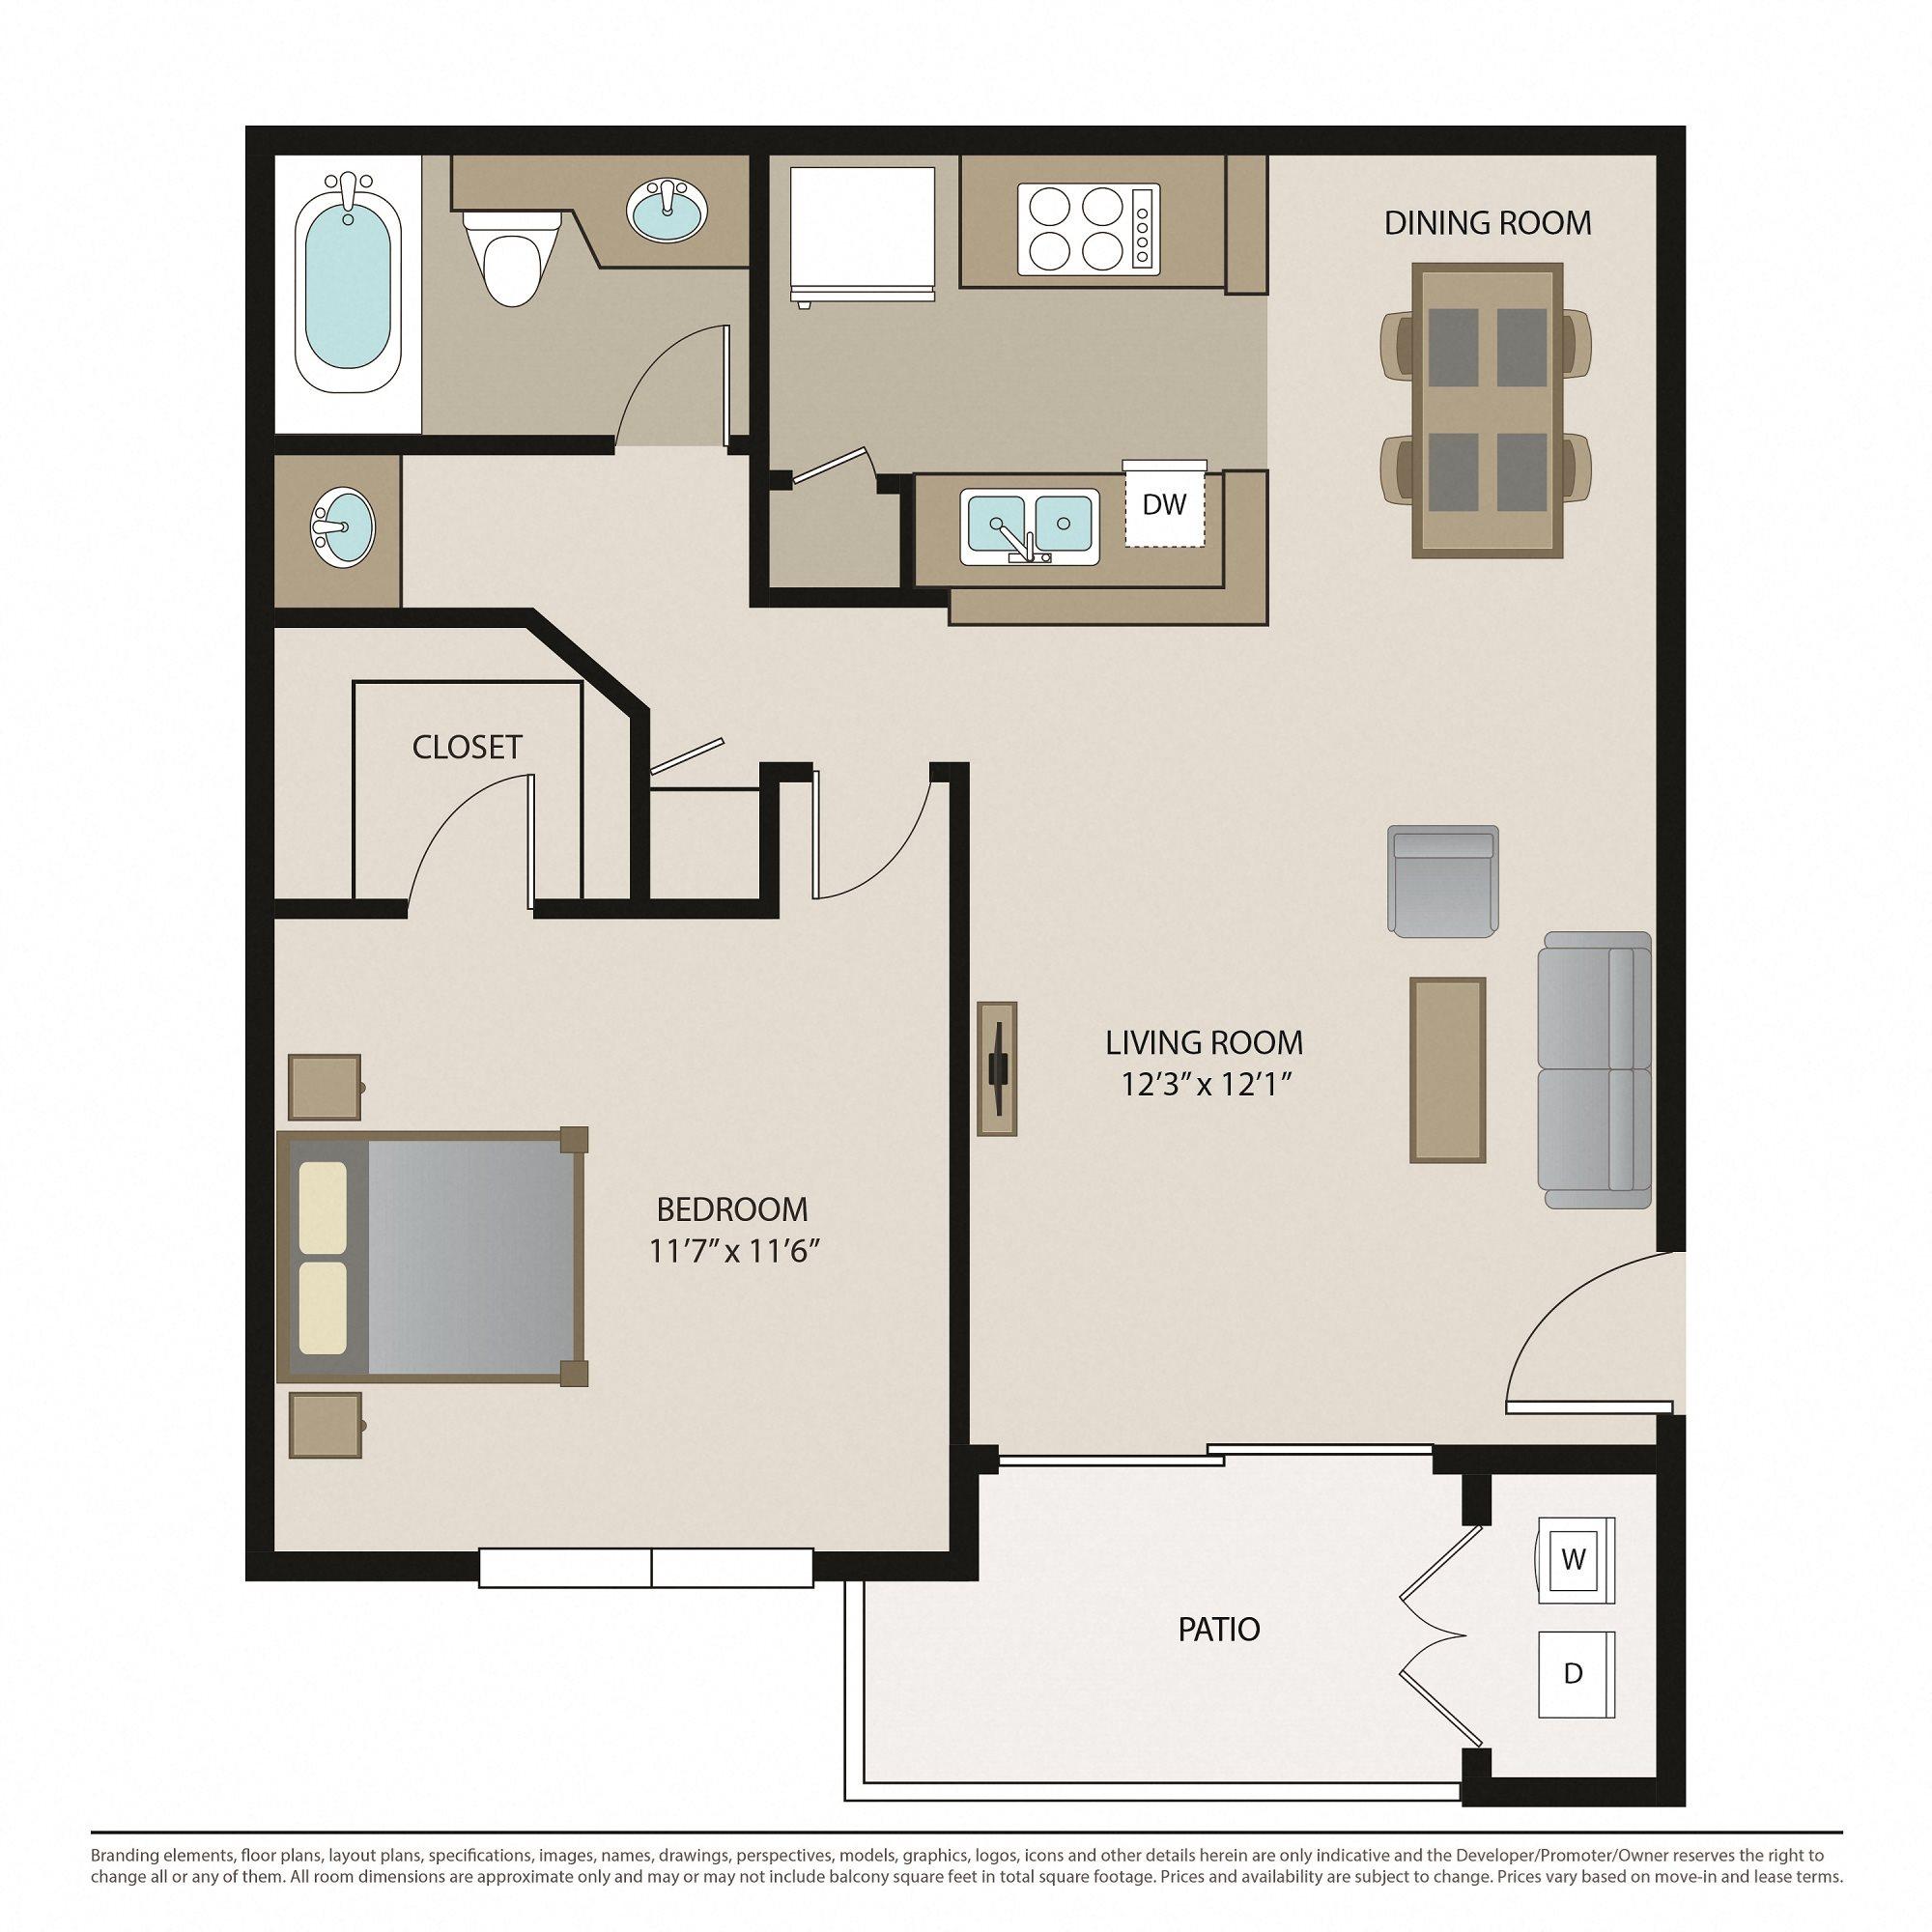 2 Bedroom Apartment Floor Plans: 1 & 2 Bedroom Apartments In Chino Hills, CA